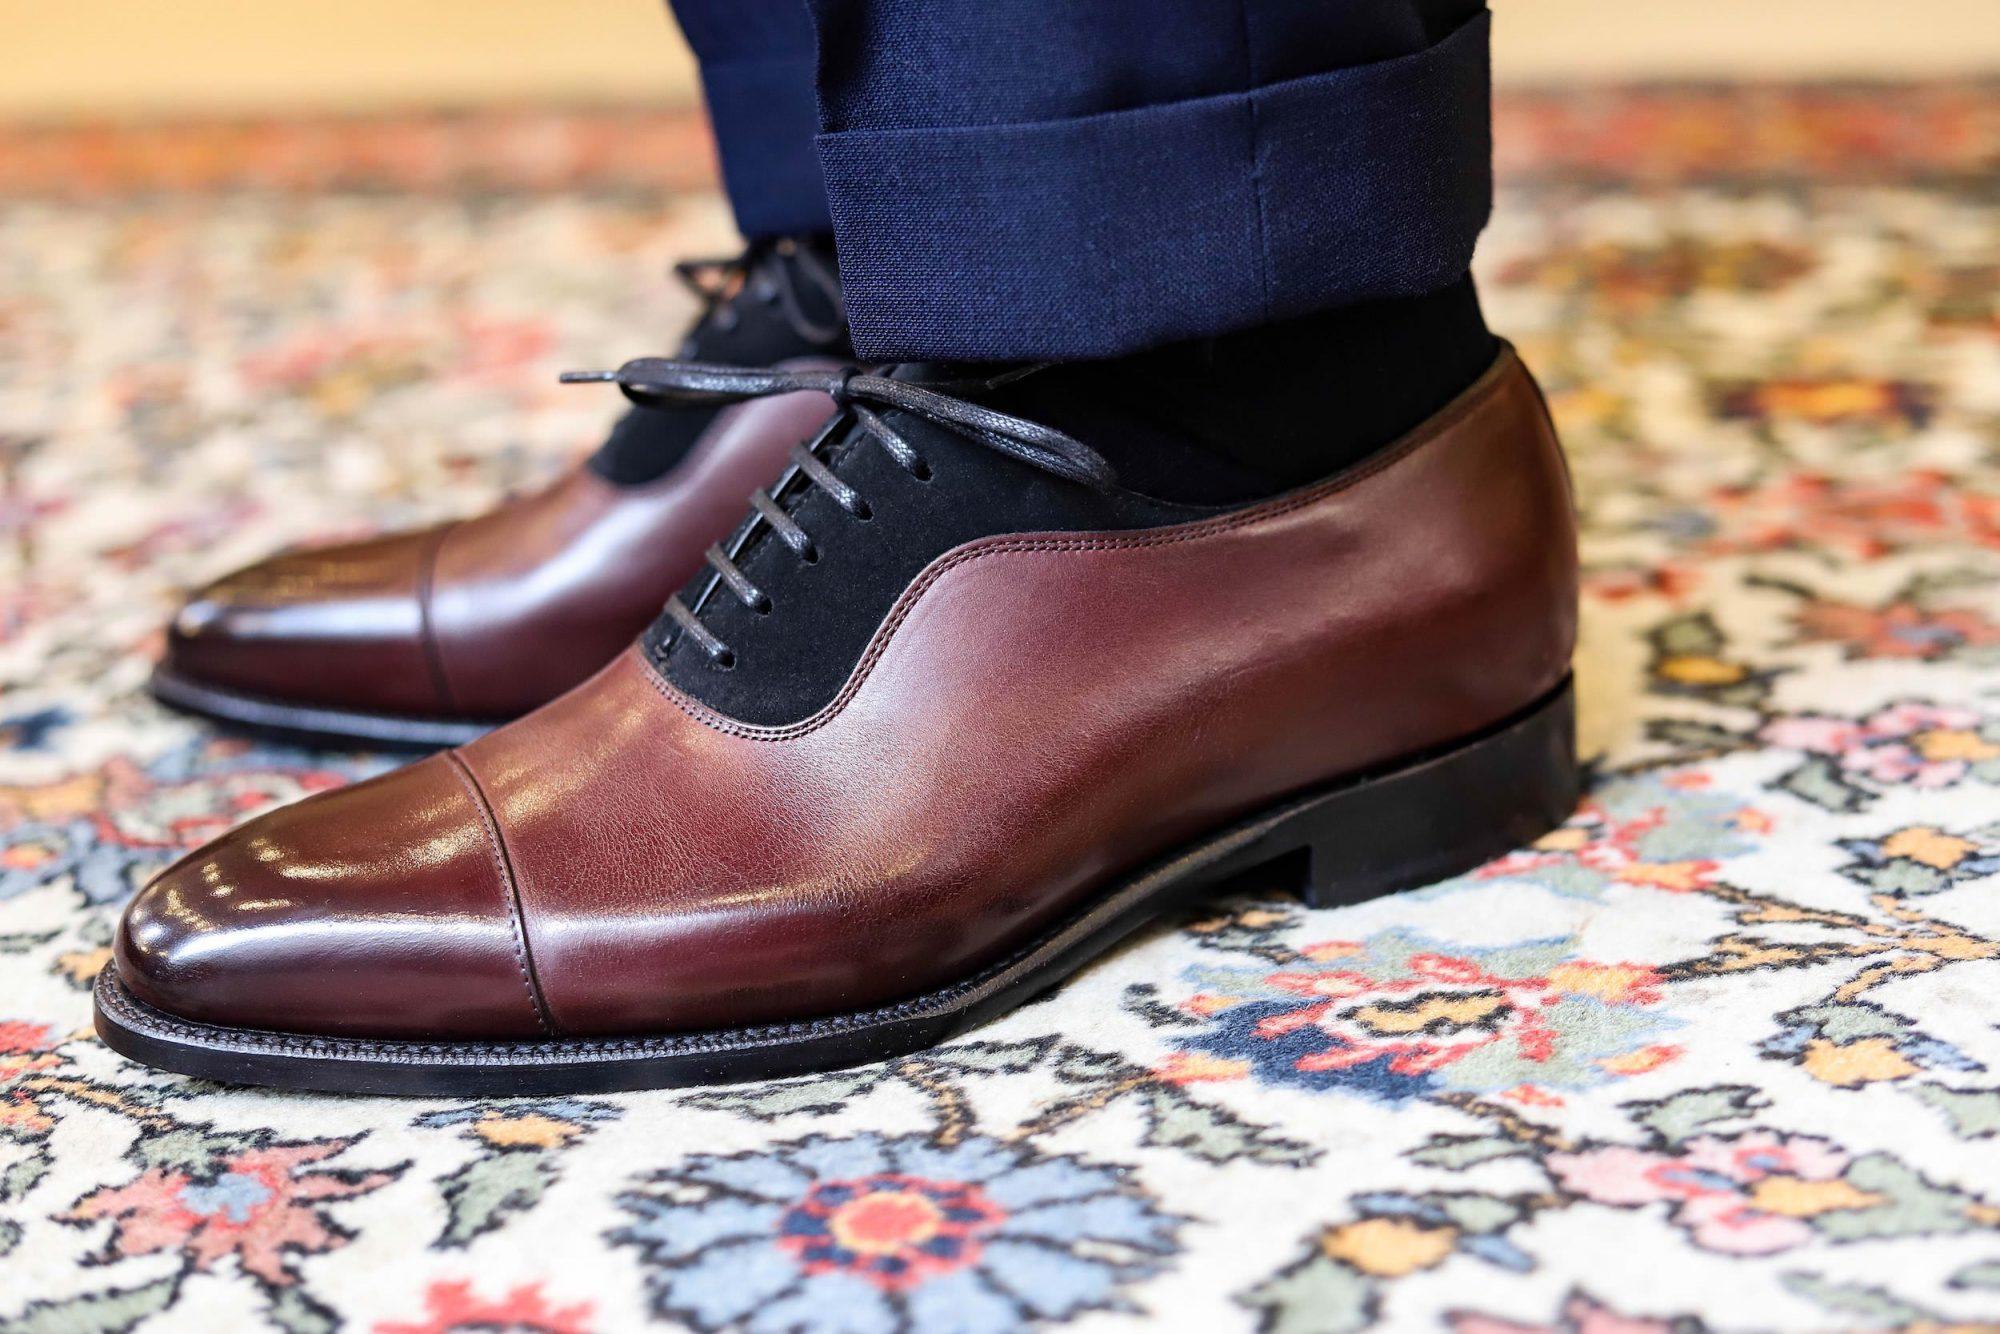 chaussures homme bi matiere